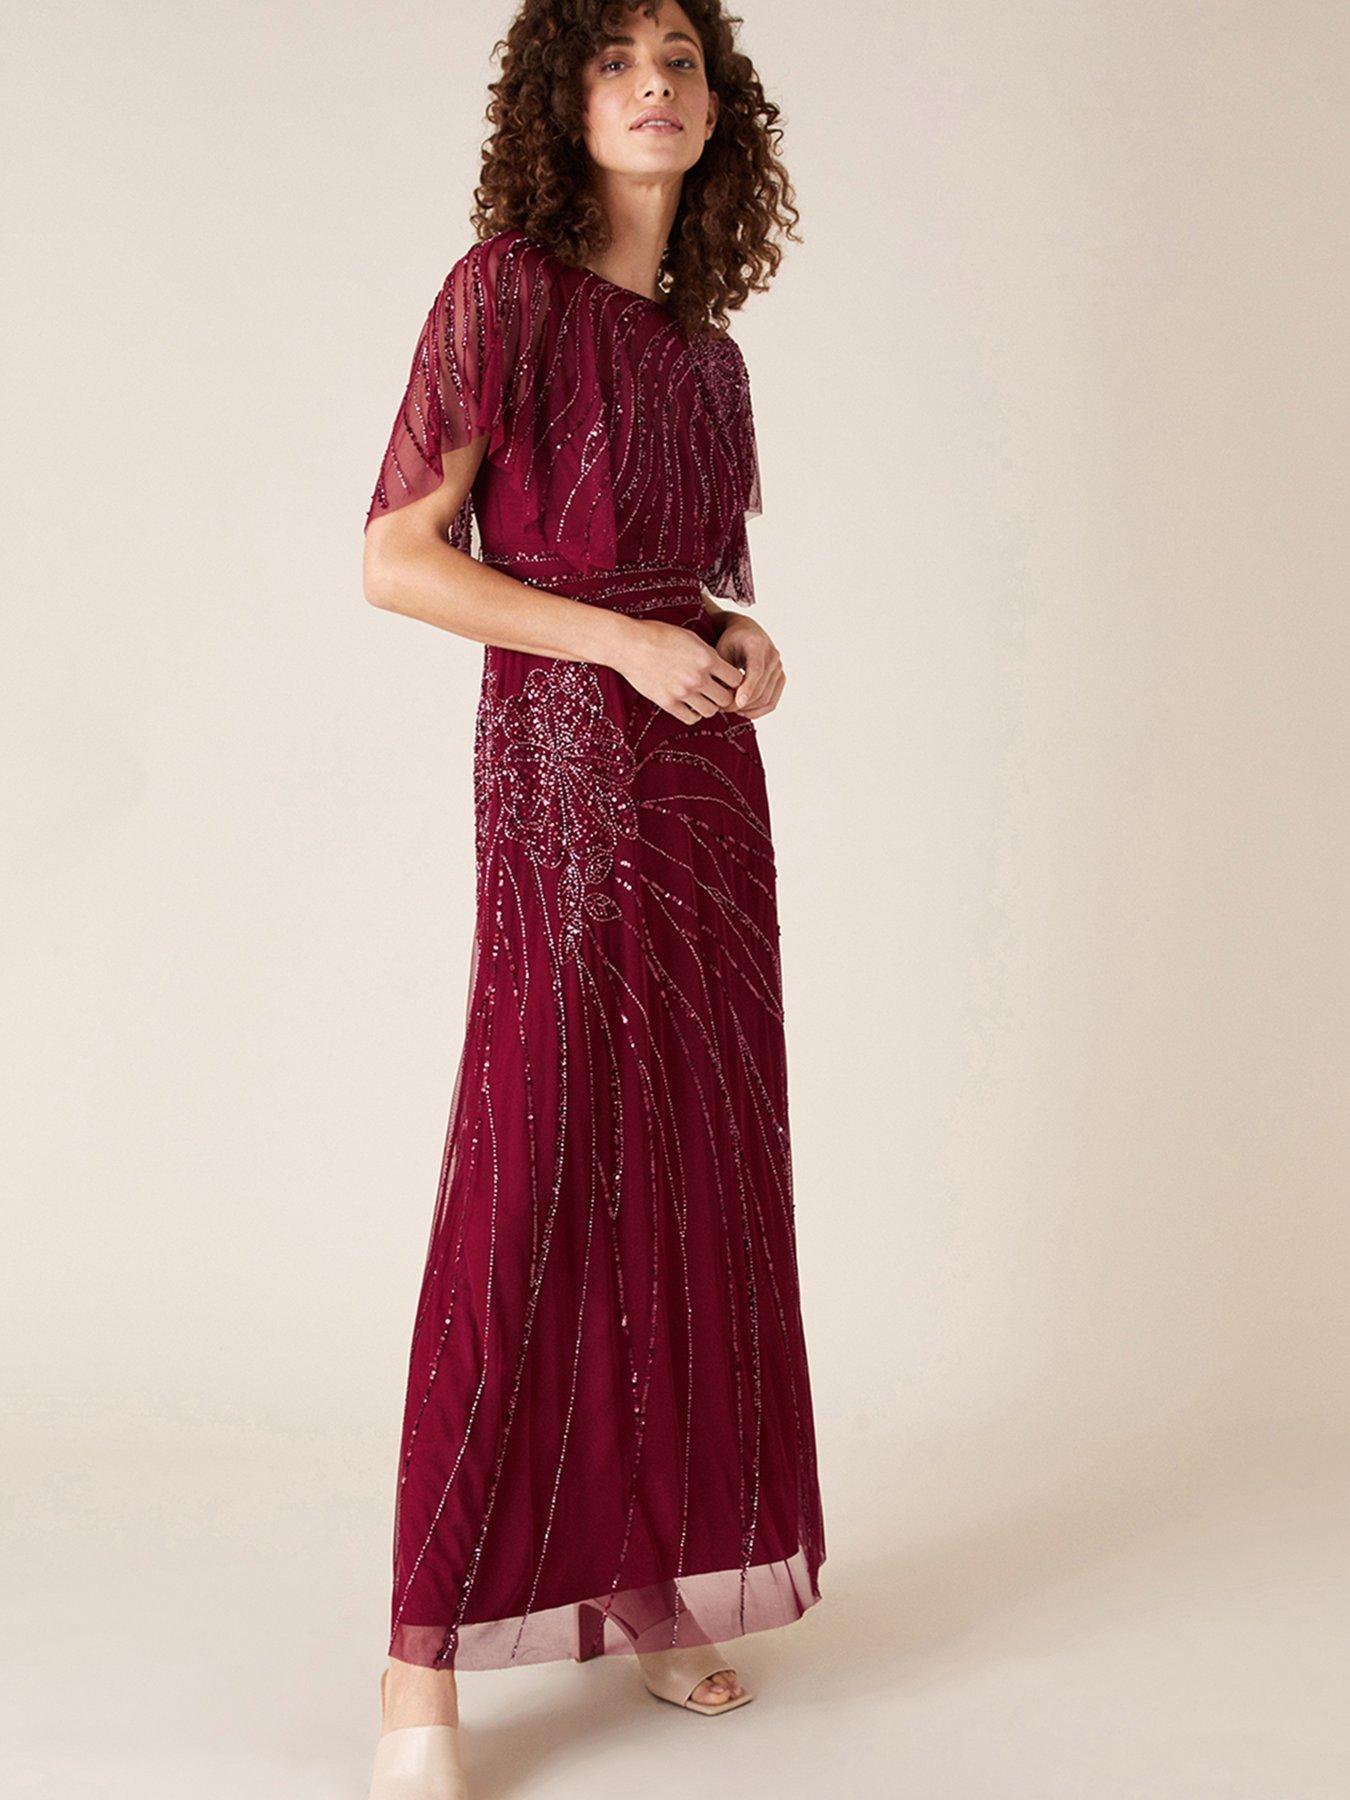 Monsoon Florence Embellished Maxi Dress - Red